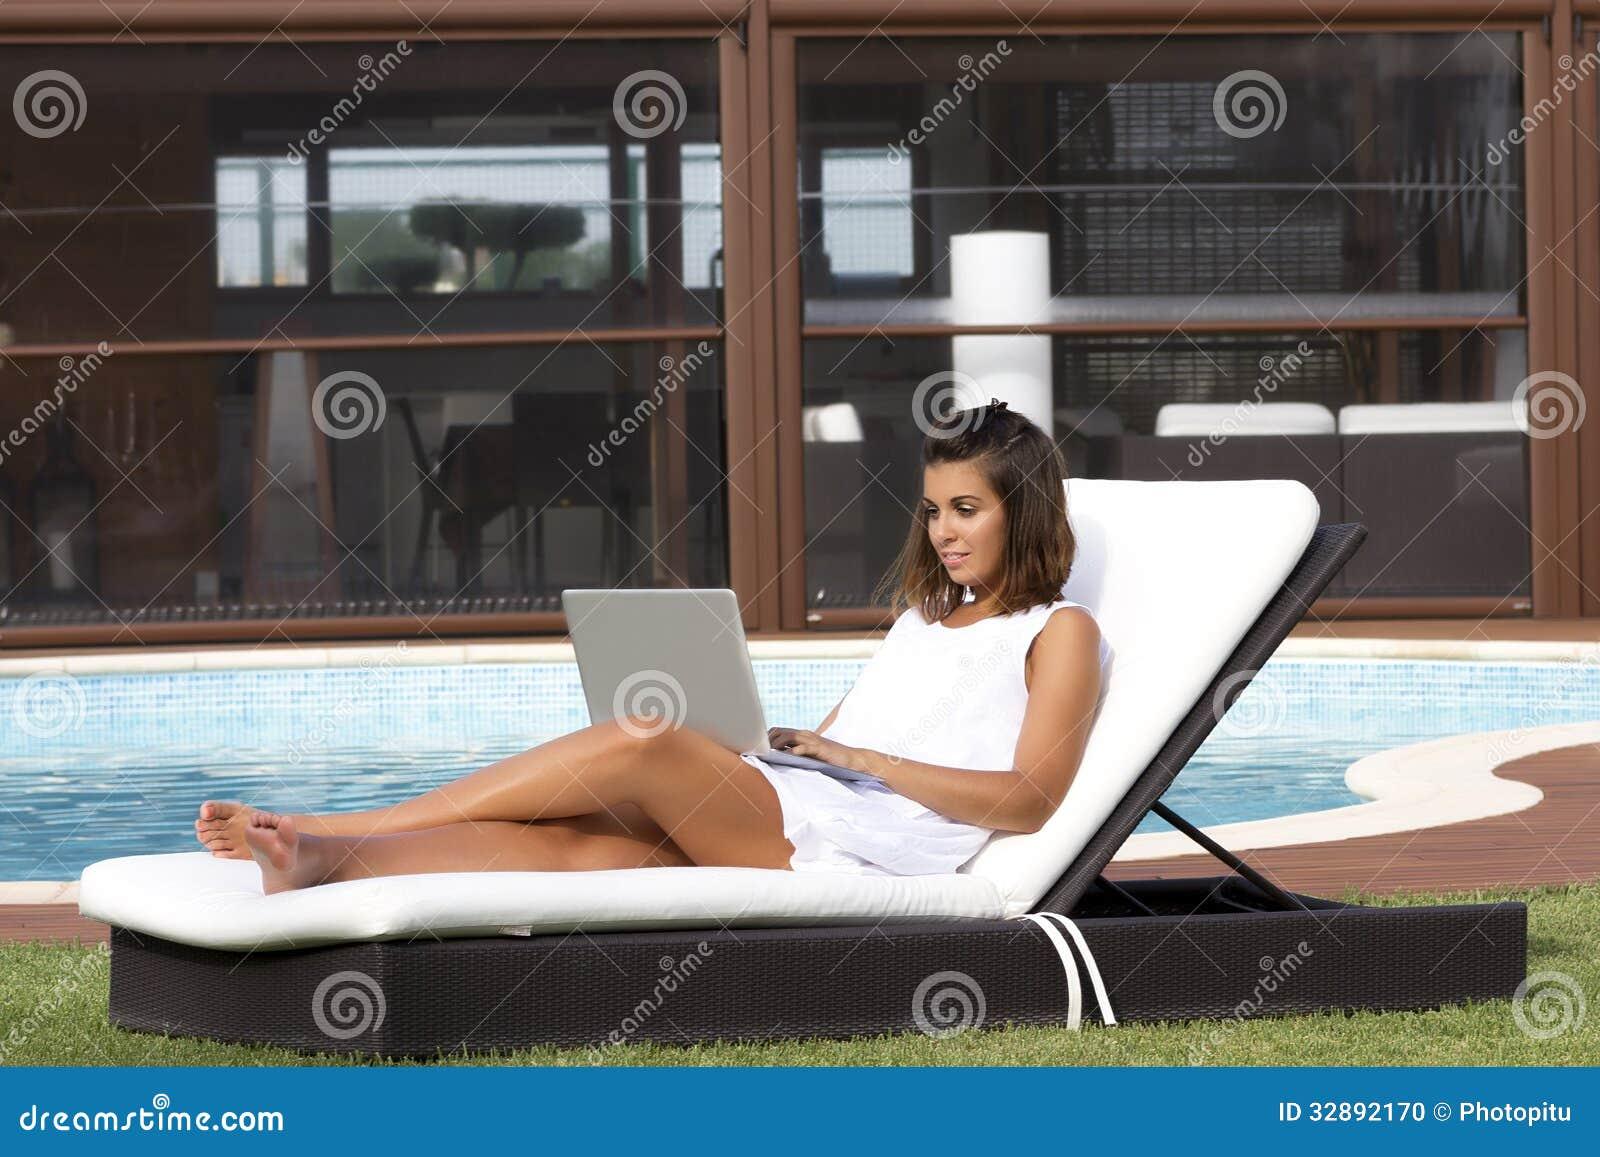 Sunbathing And Working Stock Photo Image 32892170